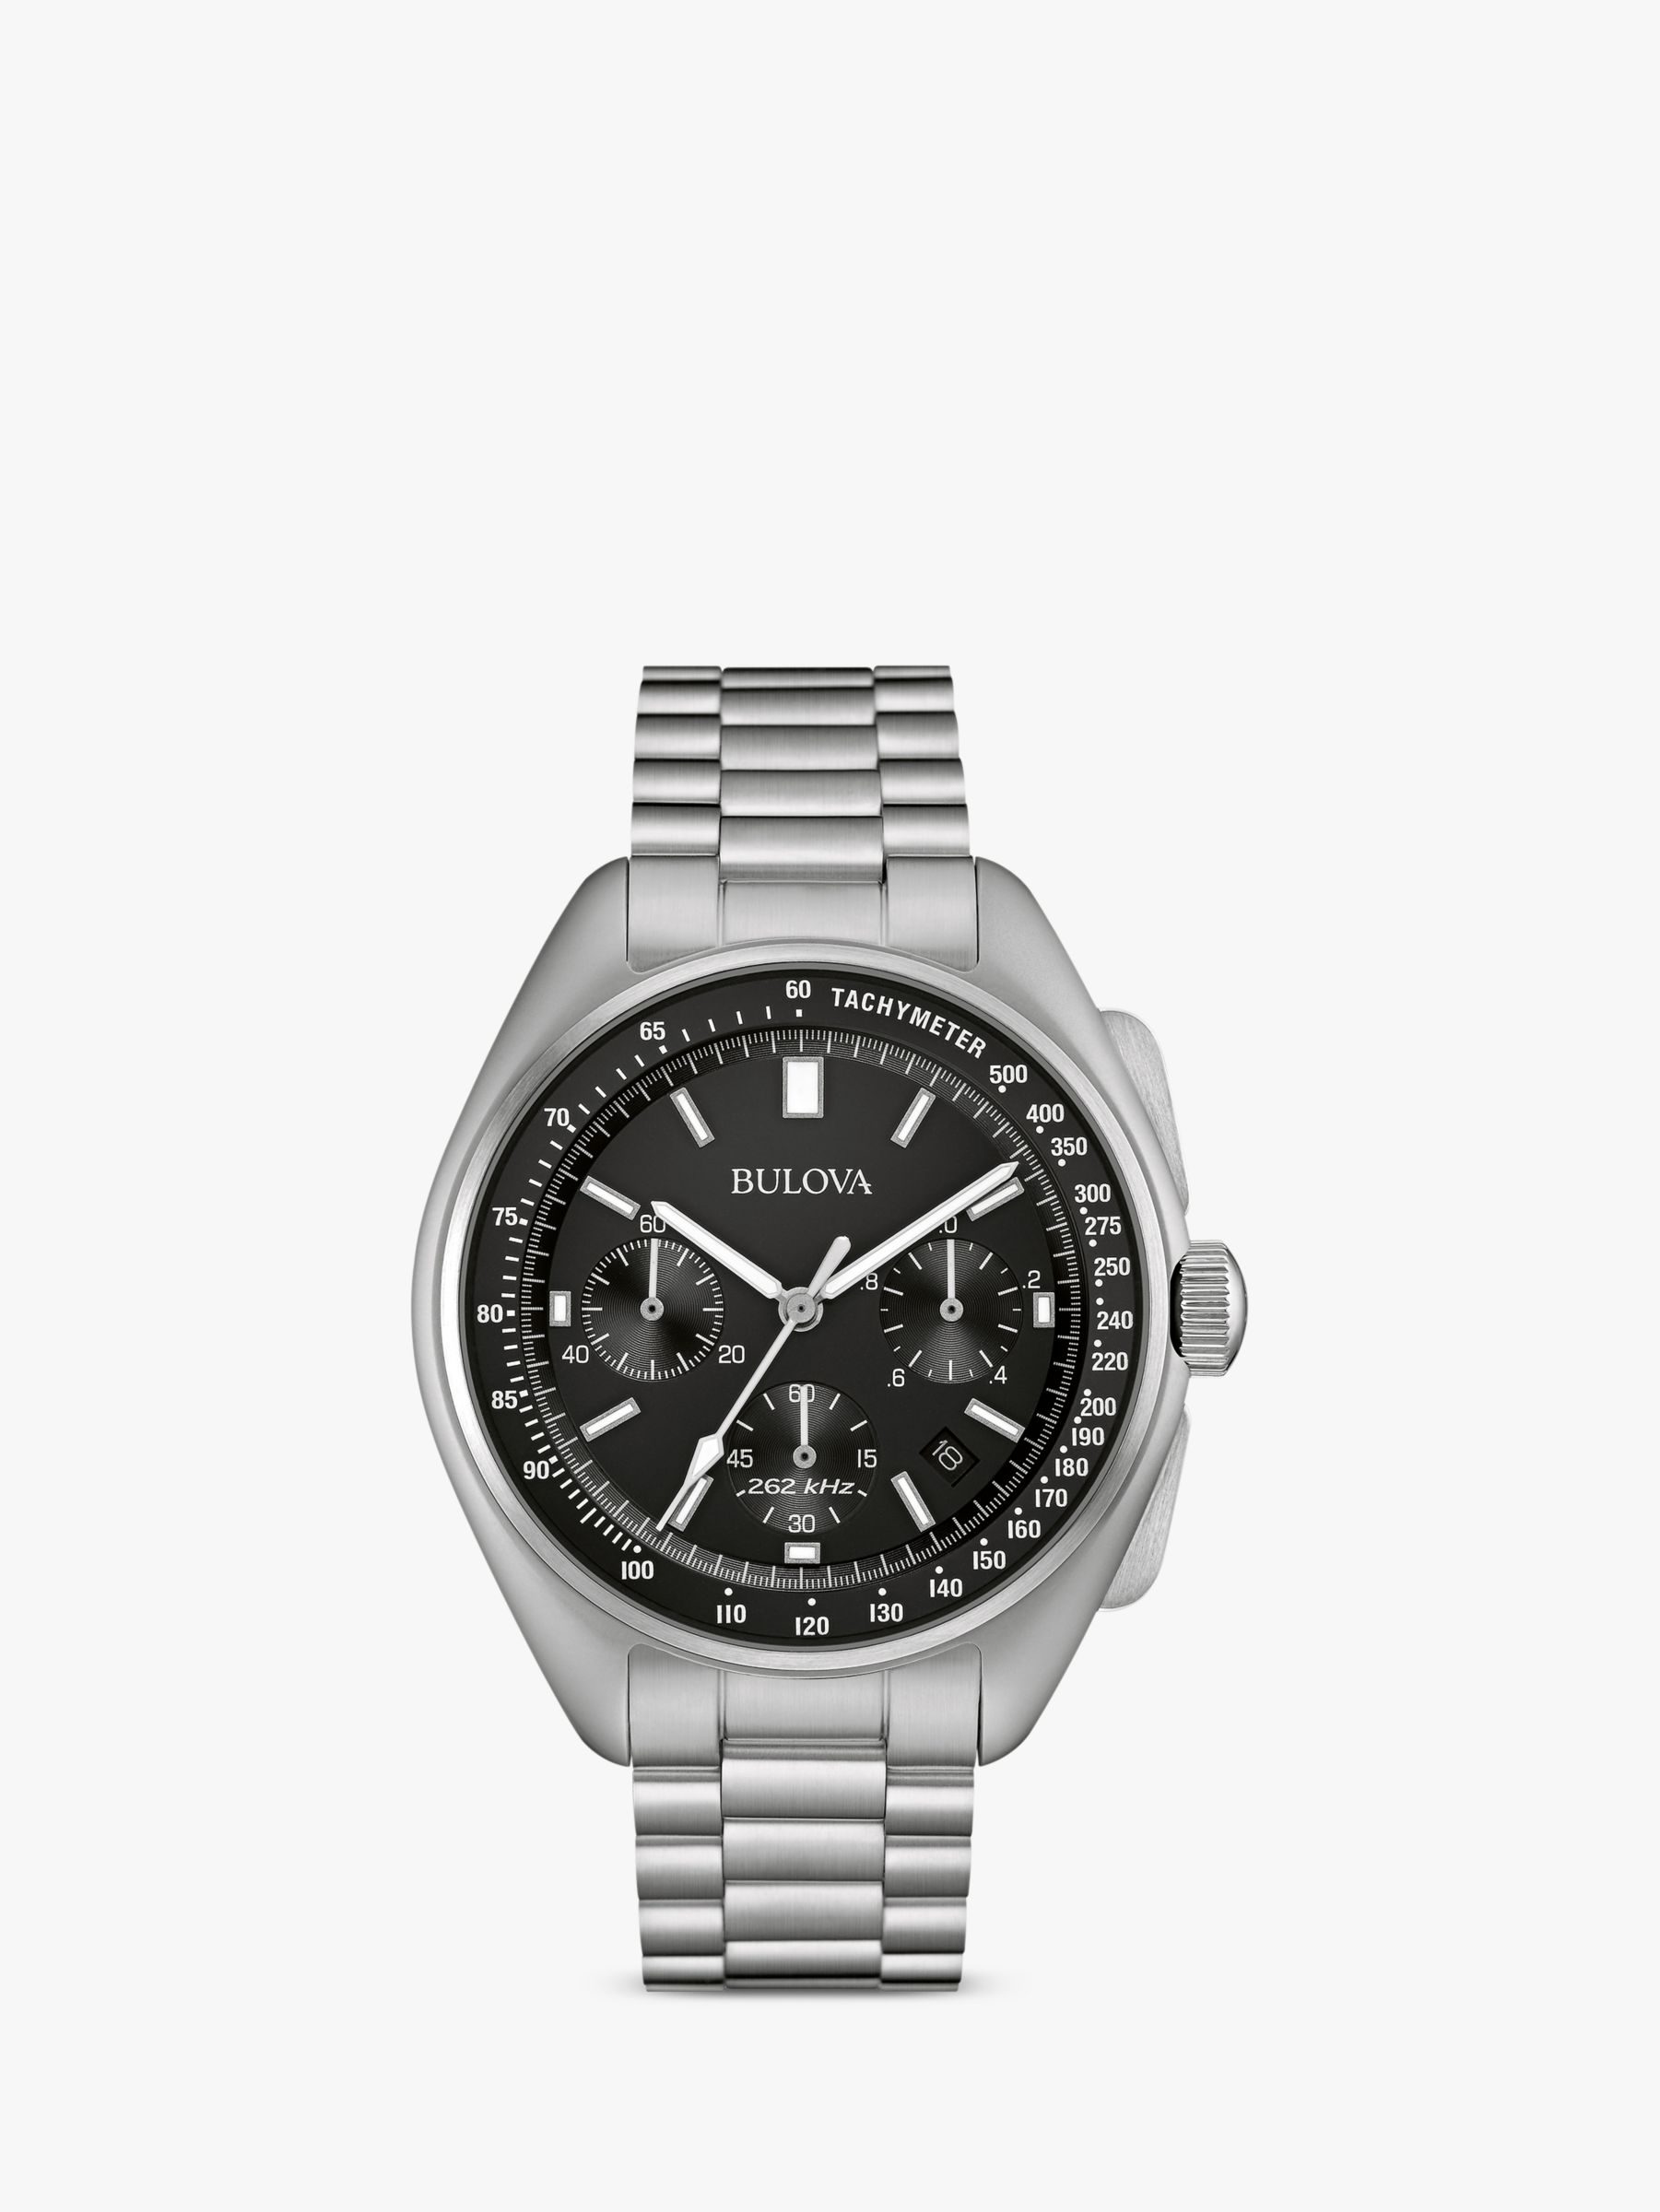 Bulova Bulova 96B258 Men's Archive Lunar Pilot Date Single Chronograph Bracelet Strap Watch, Silver/Black